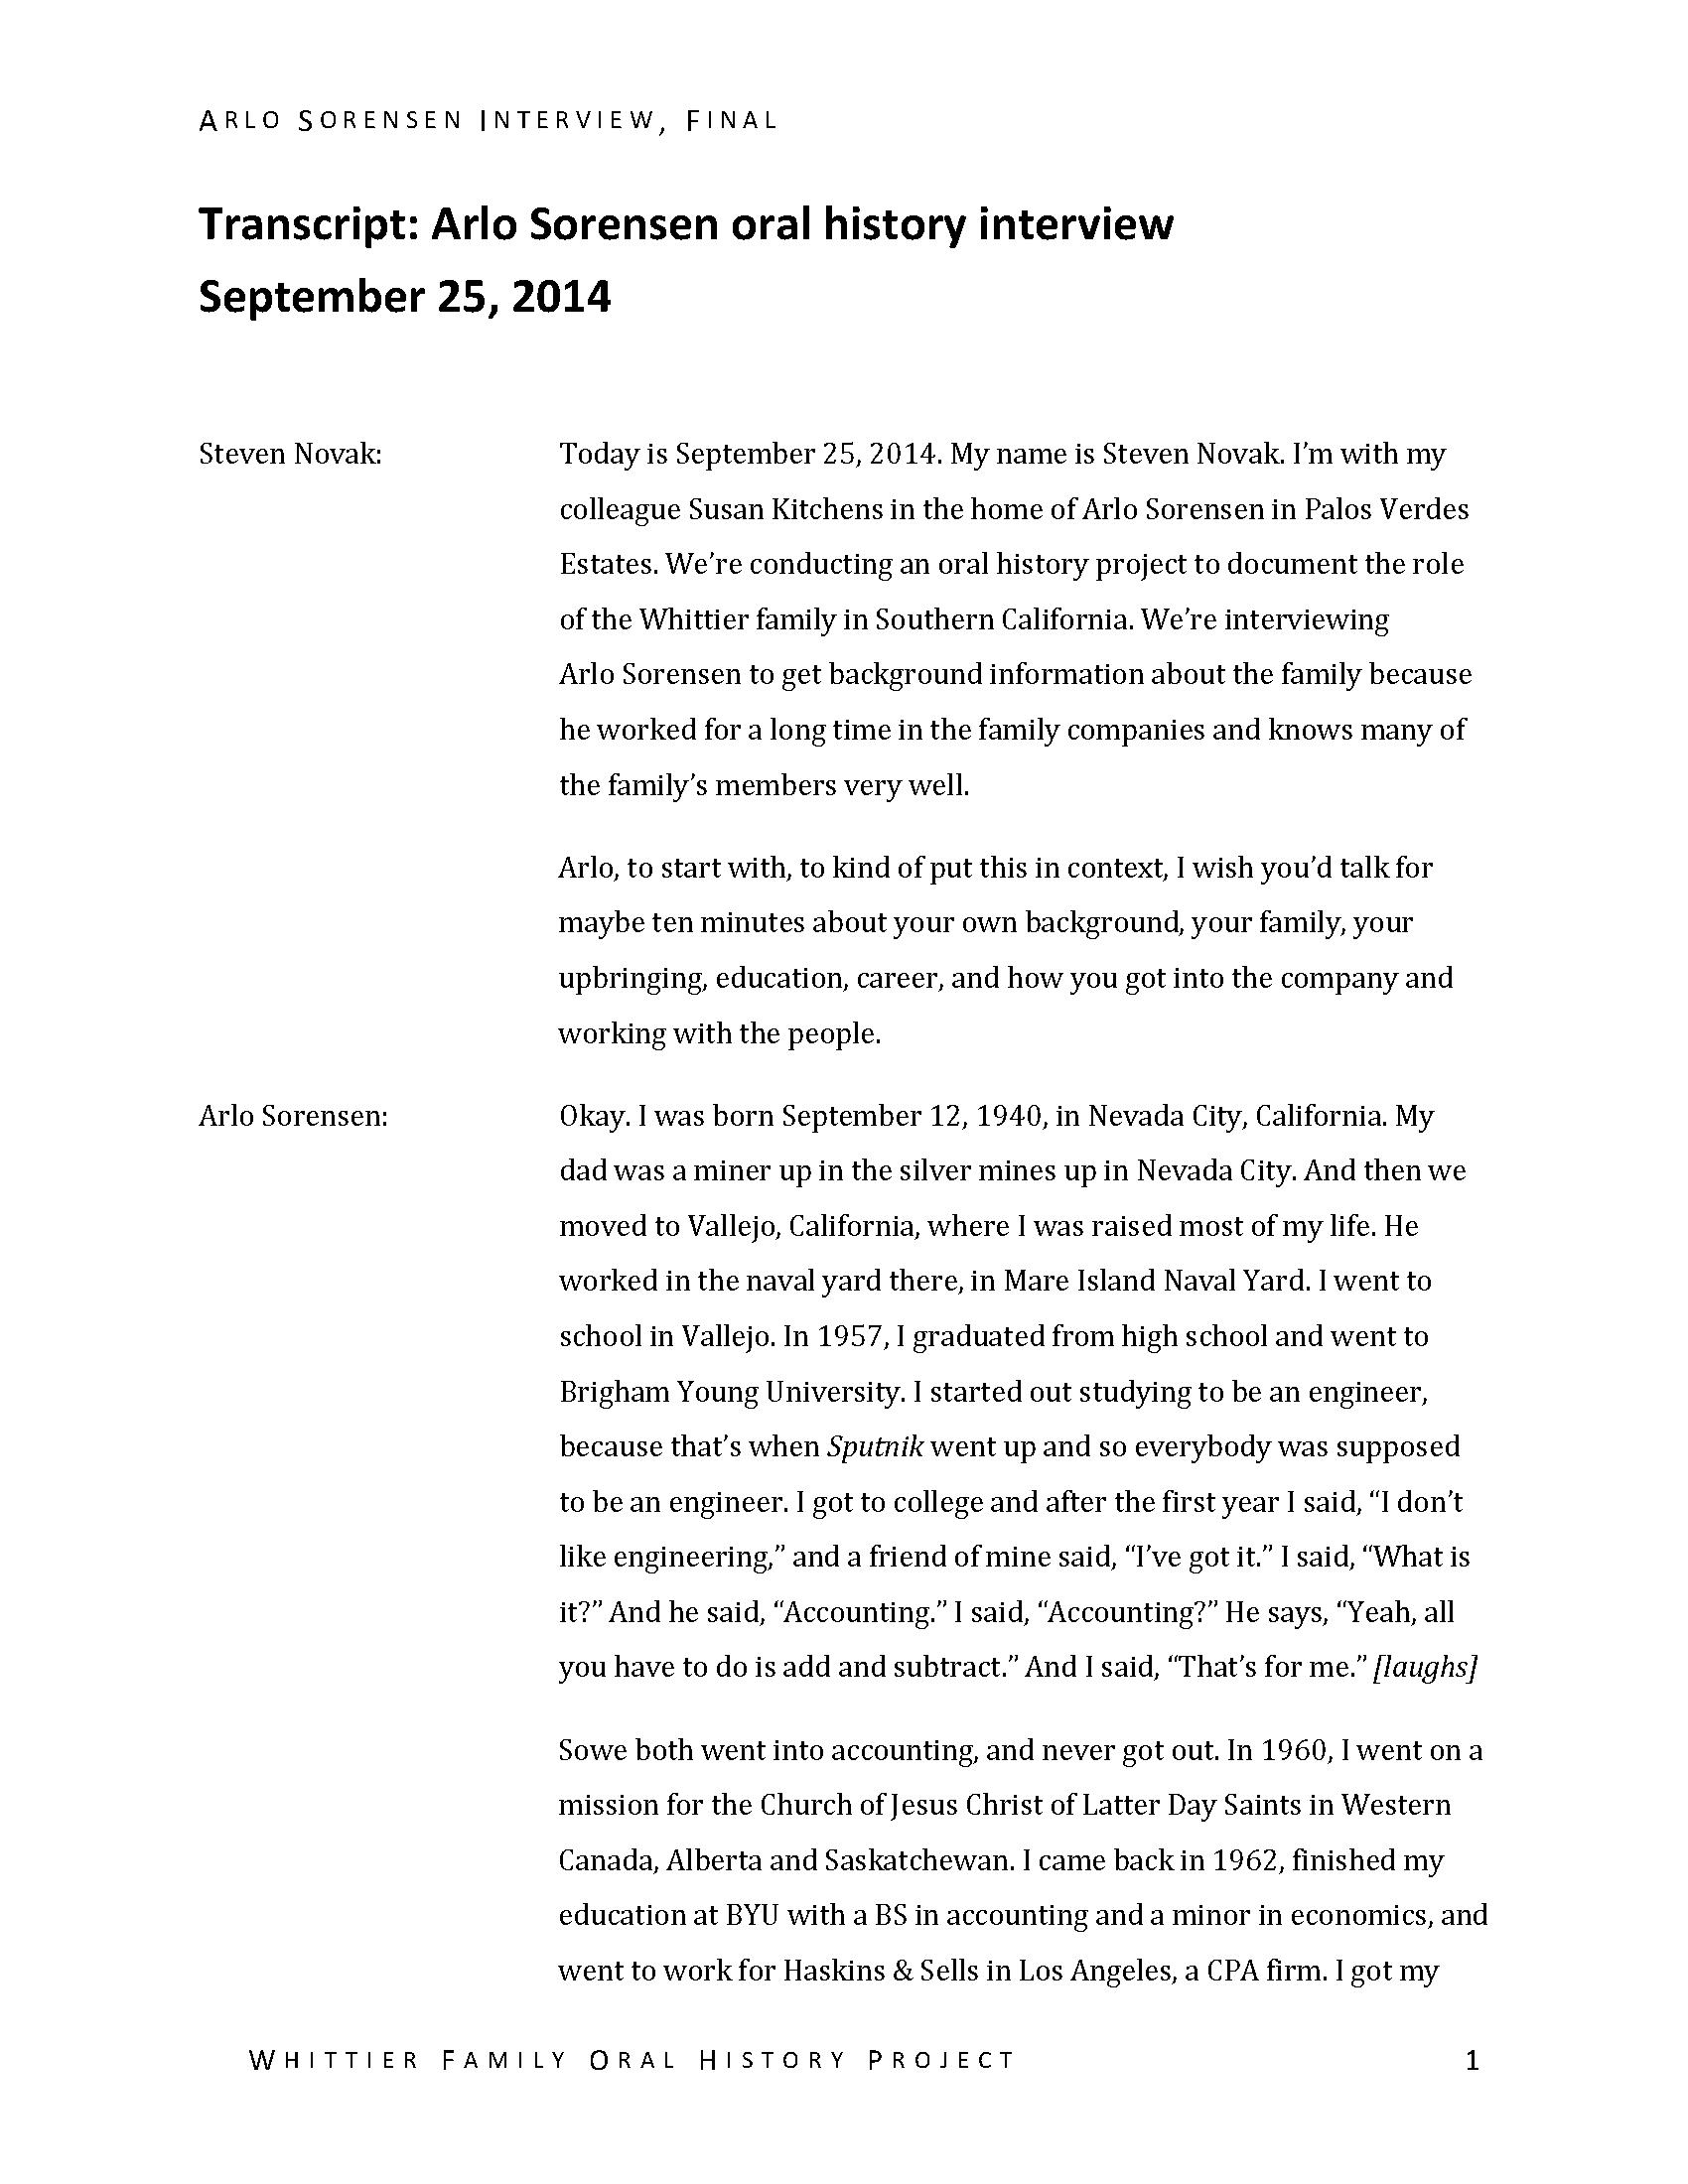 Arlo Sorensen oral history interview  - Manuscripts - Huntington